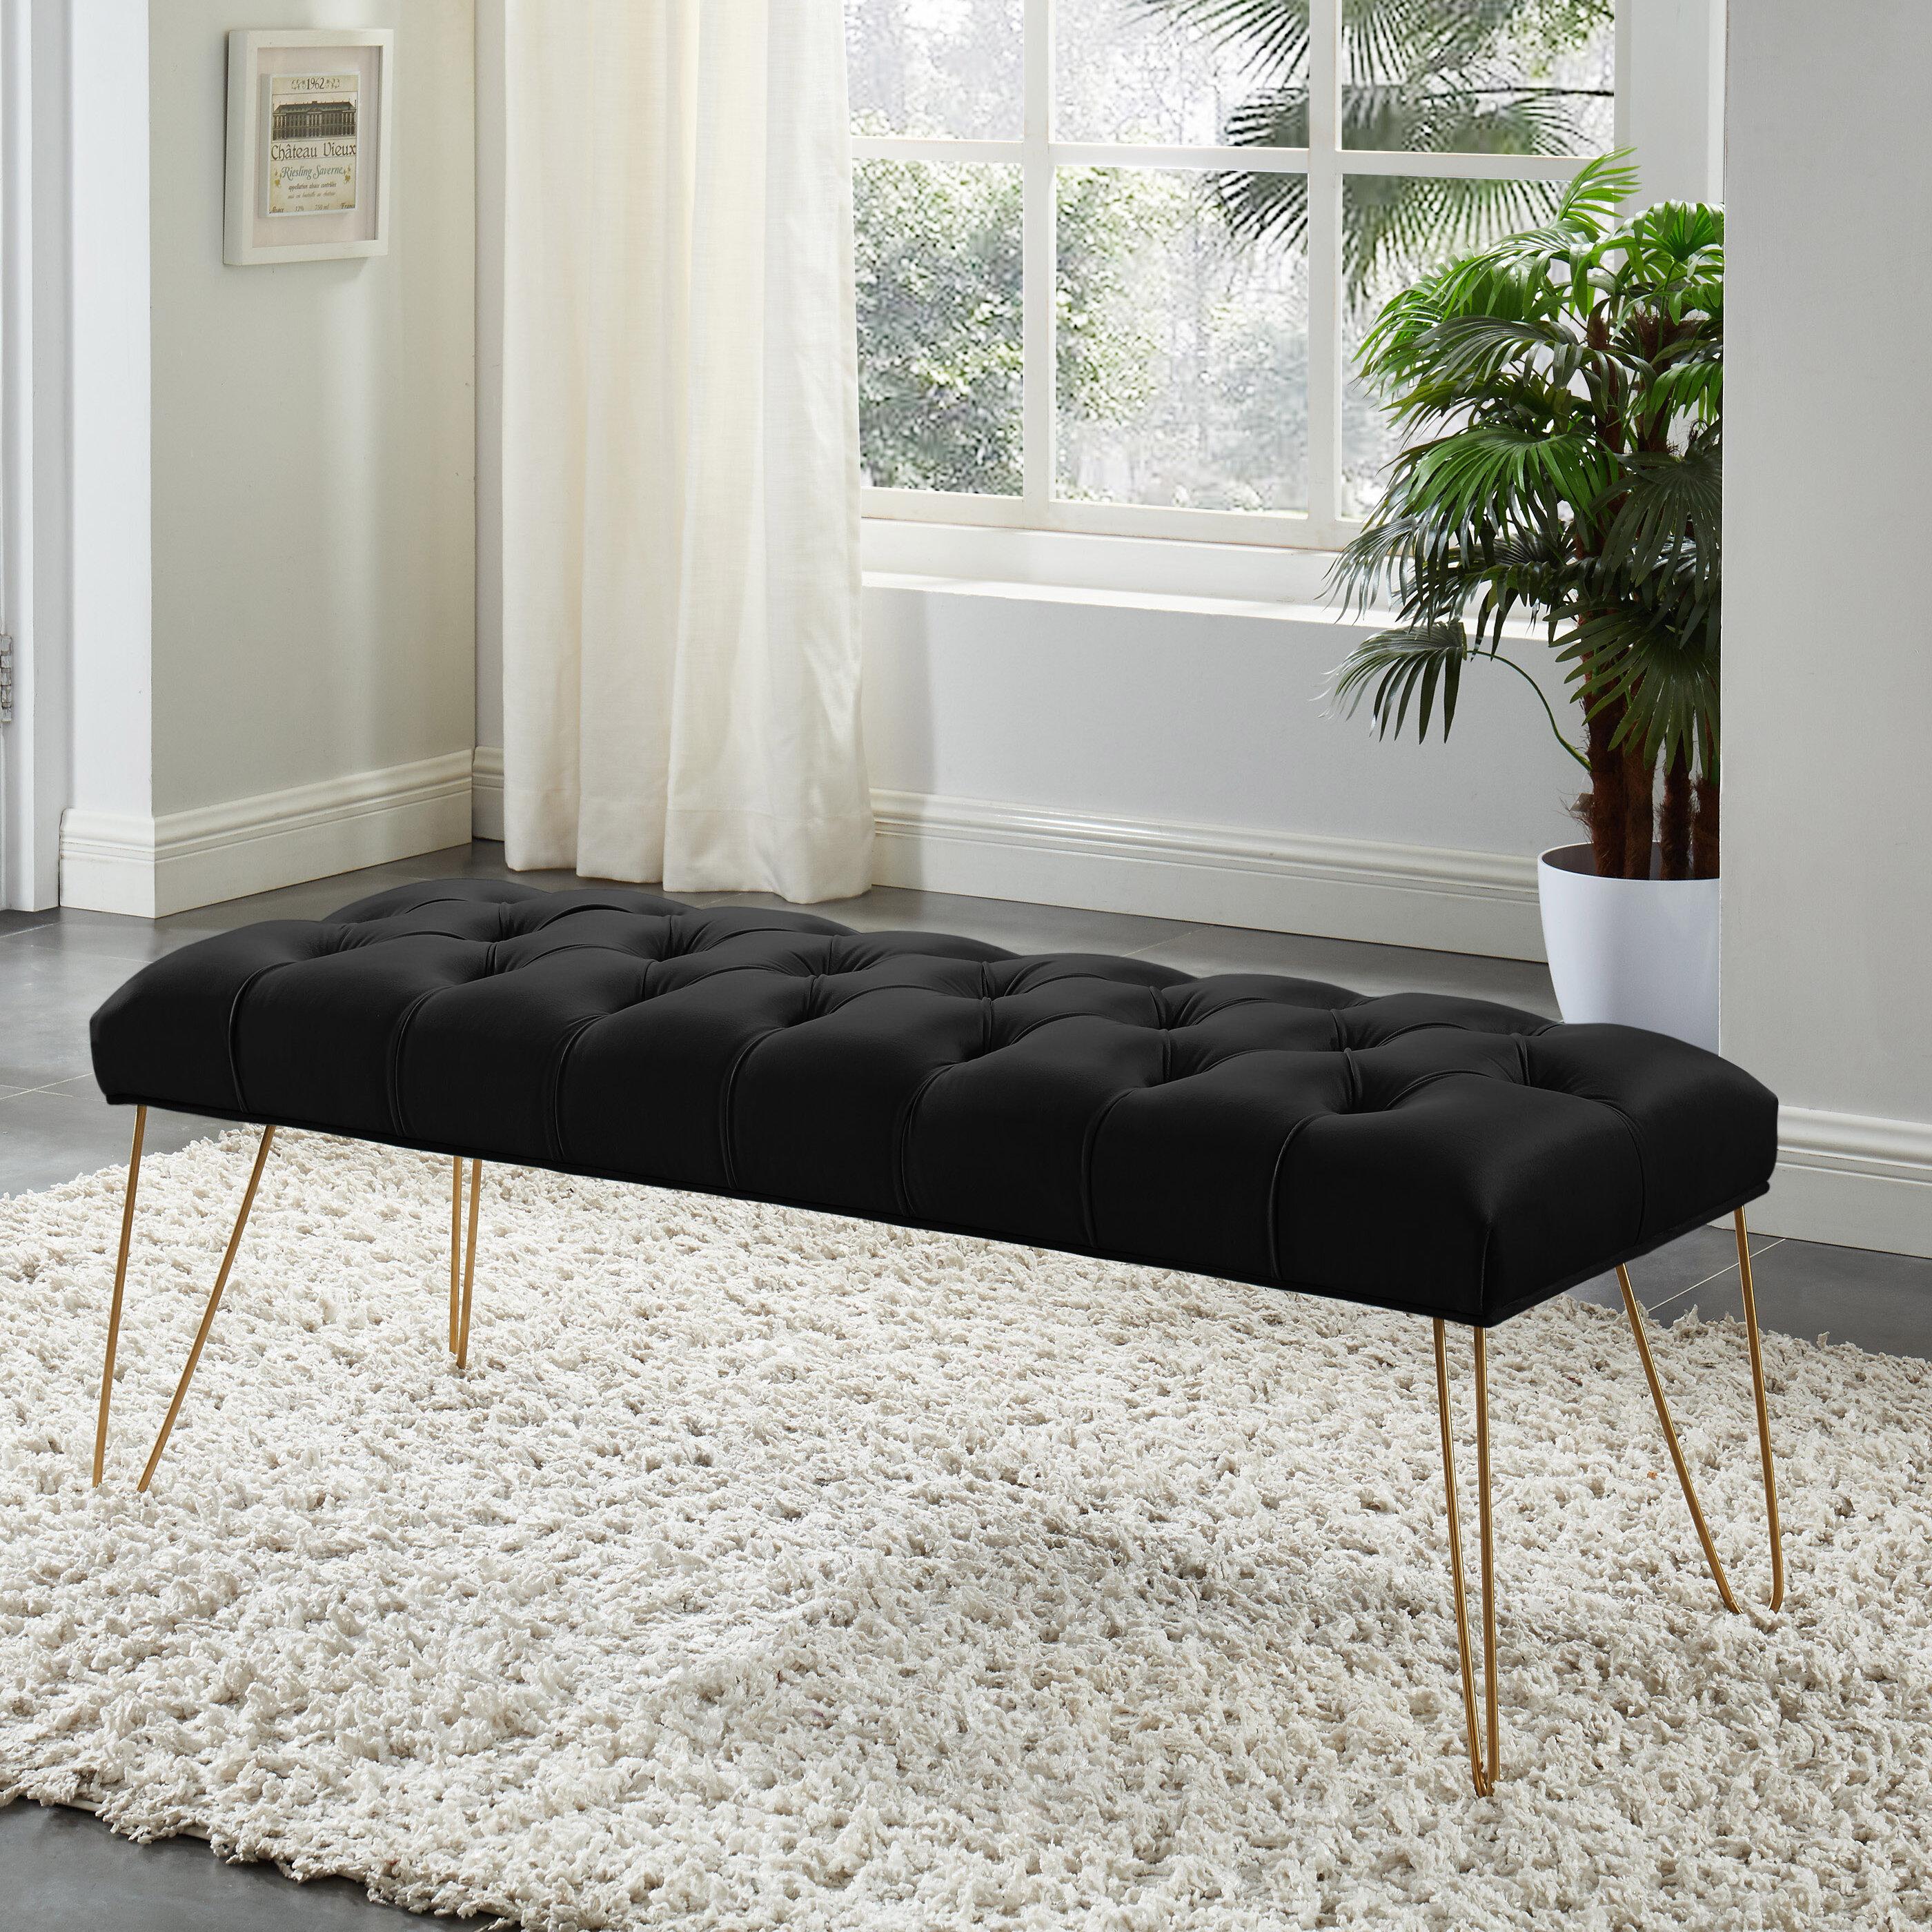 Mercer41 Chadron Bench With Gold Colored Legs Black Velvet Reviews Wayfair